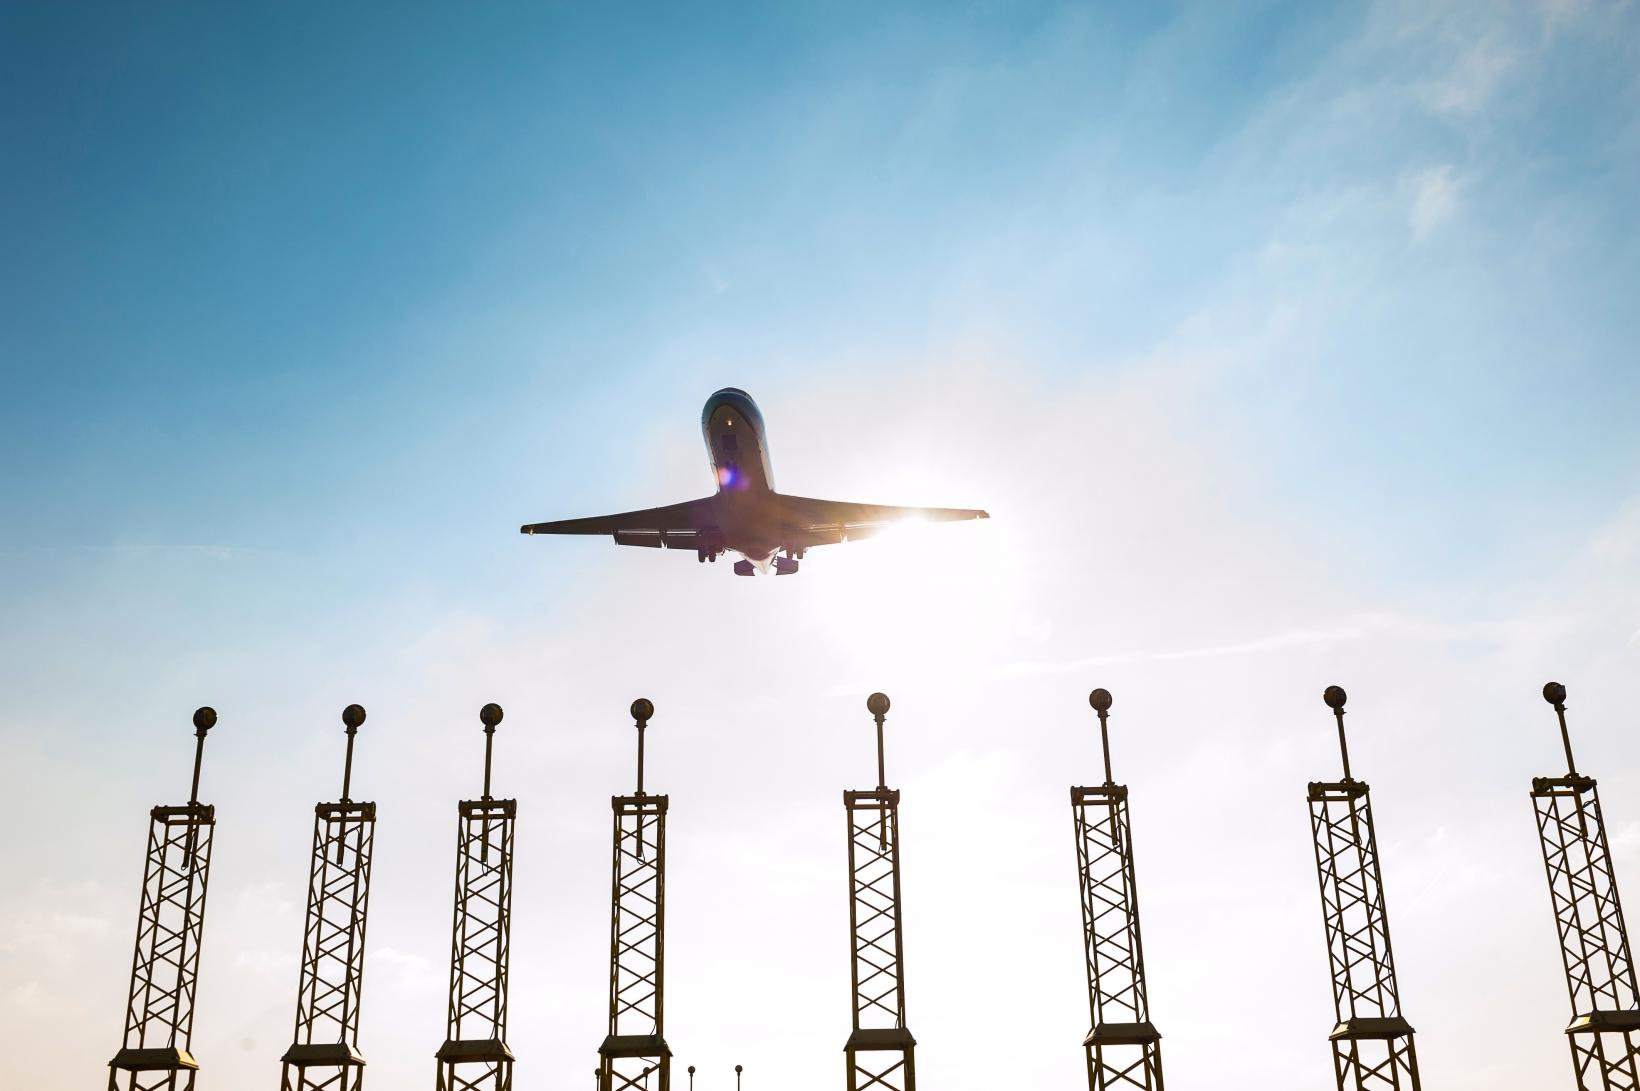 Europes Aviation Community Enthusiastic About Egnos Adoption